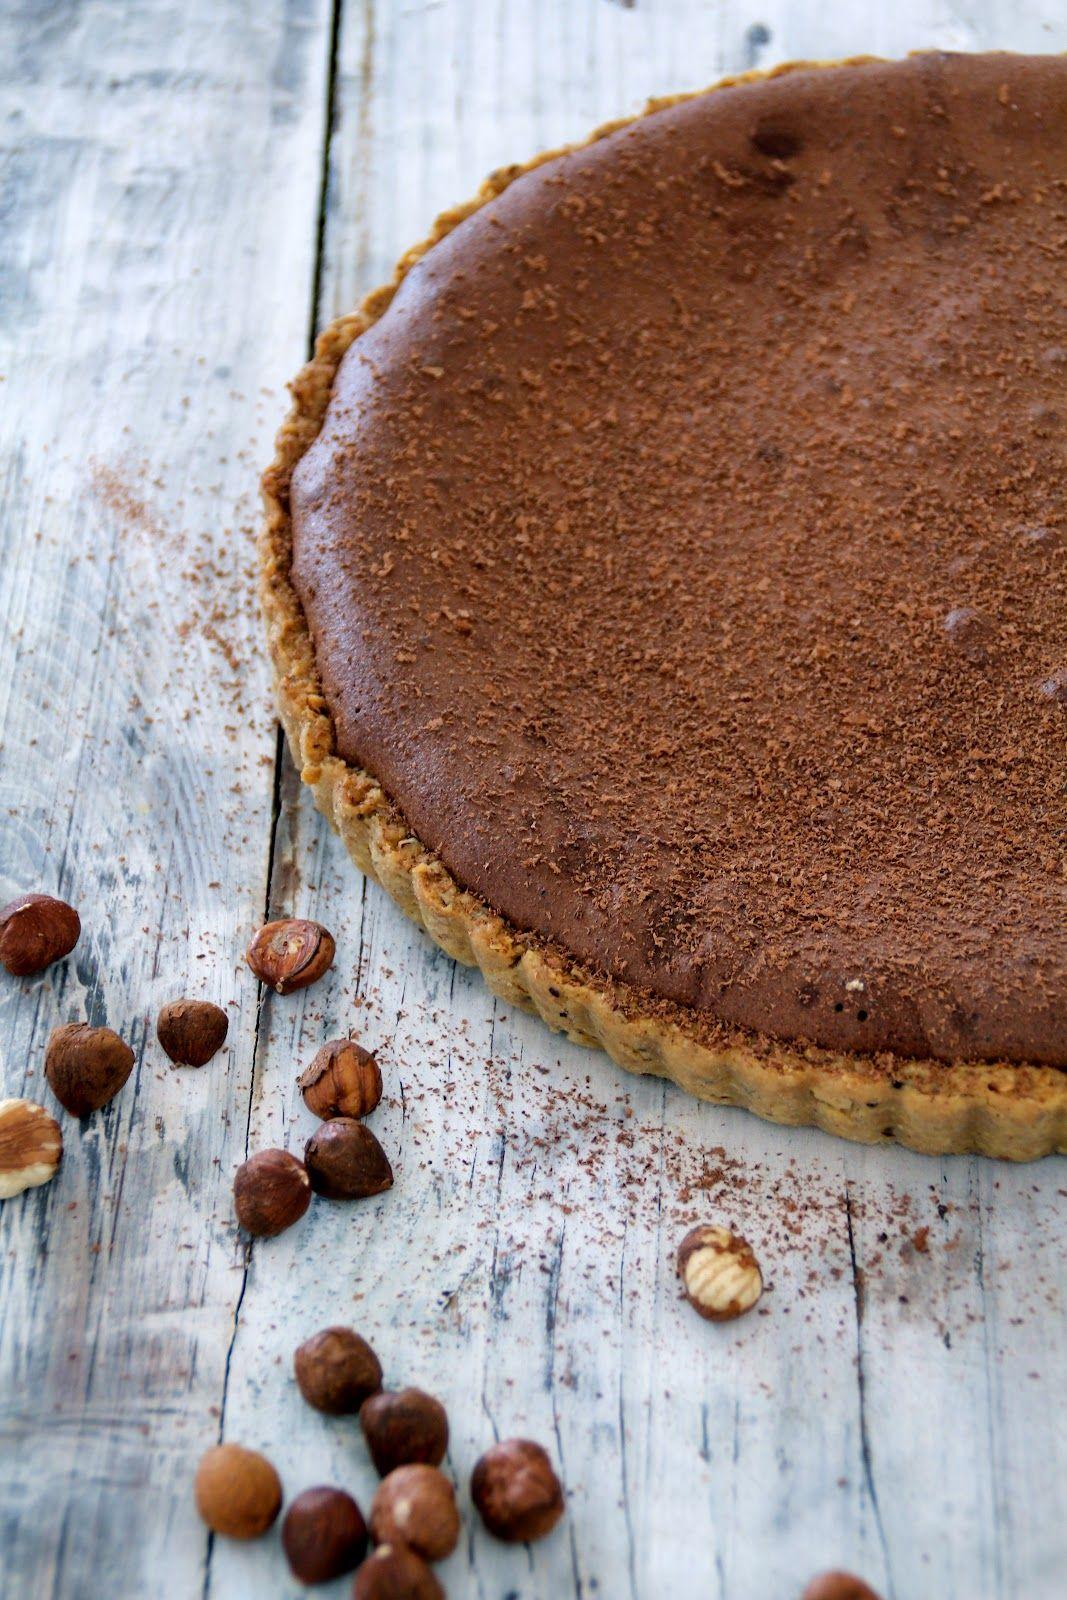 ... chocOlate cake with hazelnuts & salted caramel ...